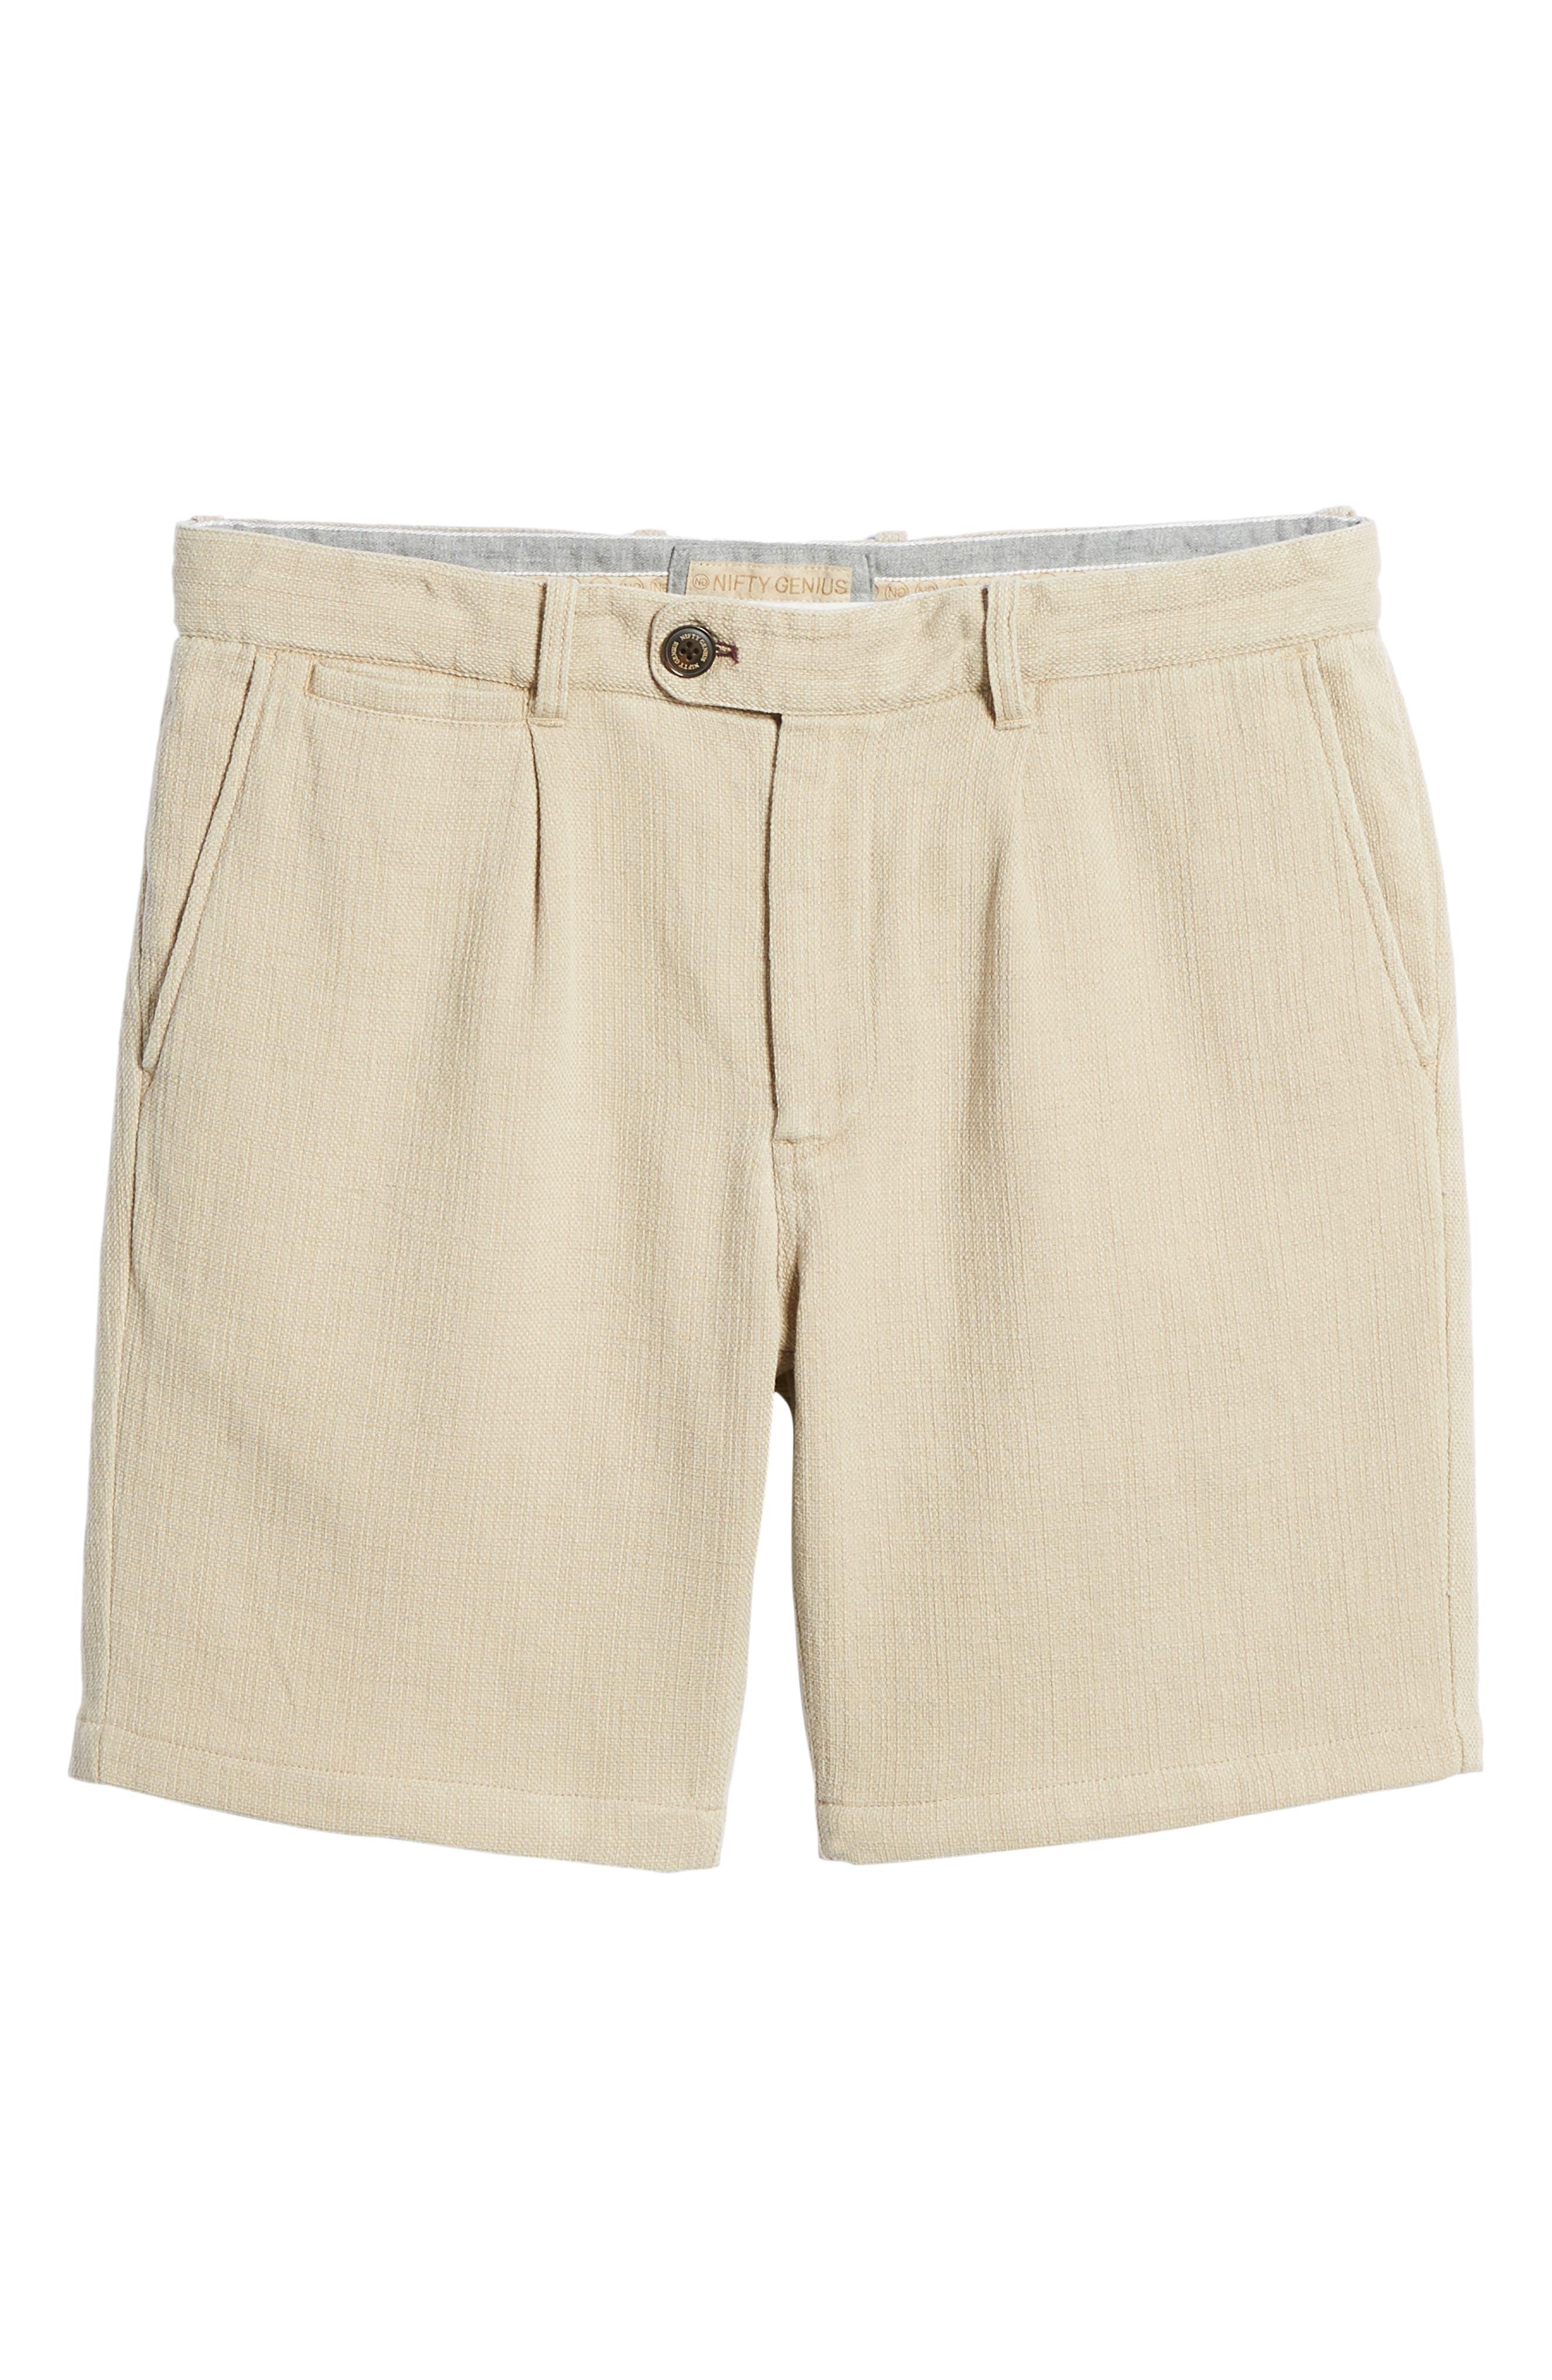 NIFTY GENIUS,                             Thomas Regular Fit Pleated Shorts,                             Alternate thumbnail 6, color,                             250